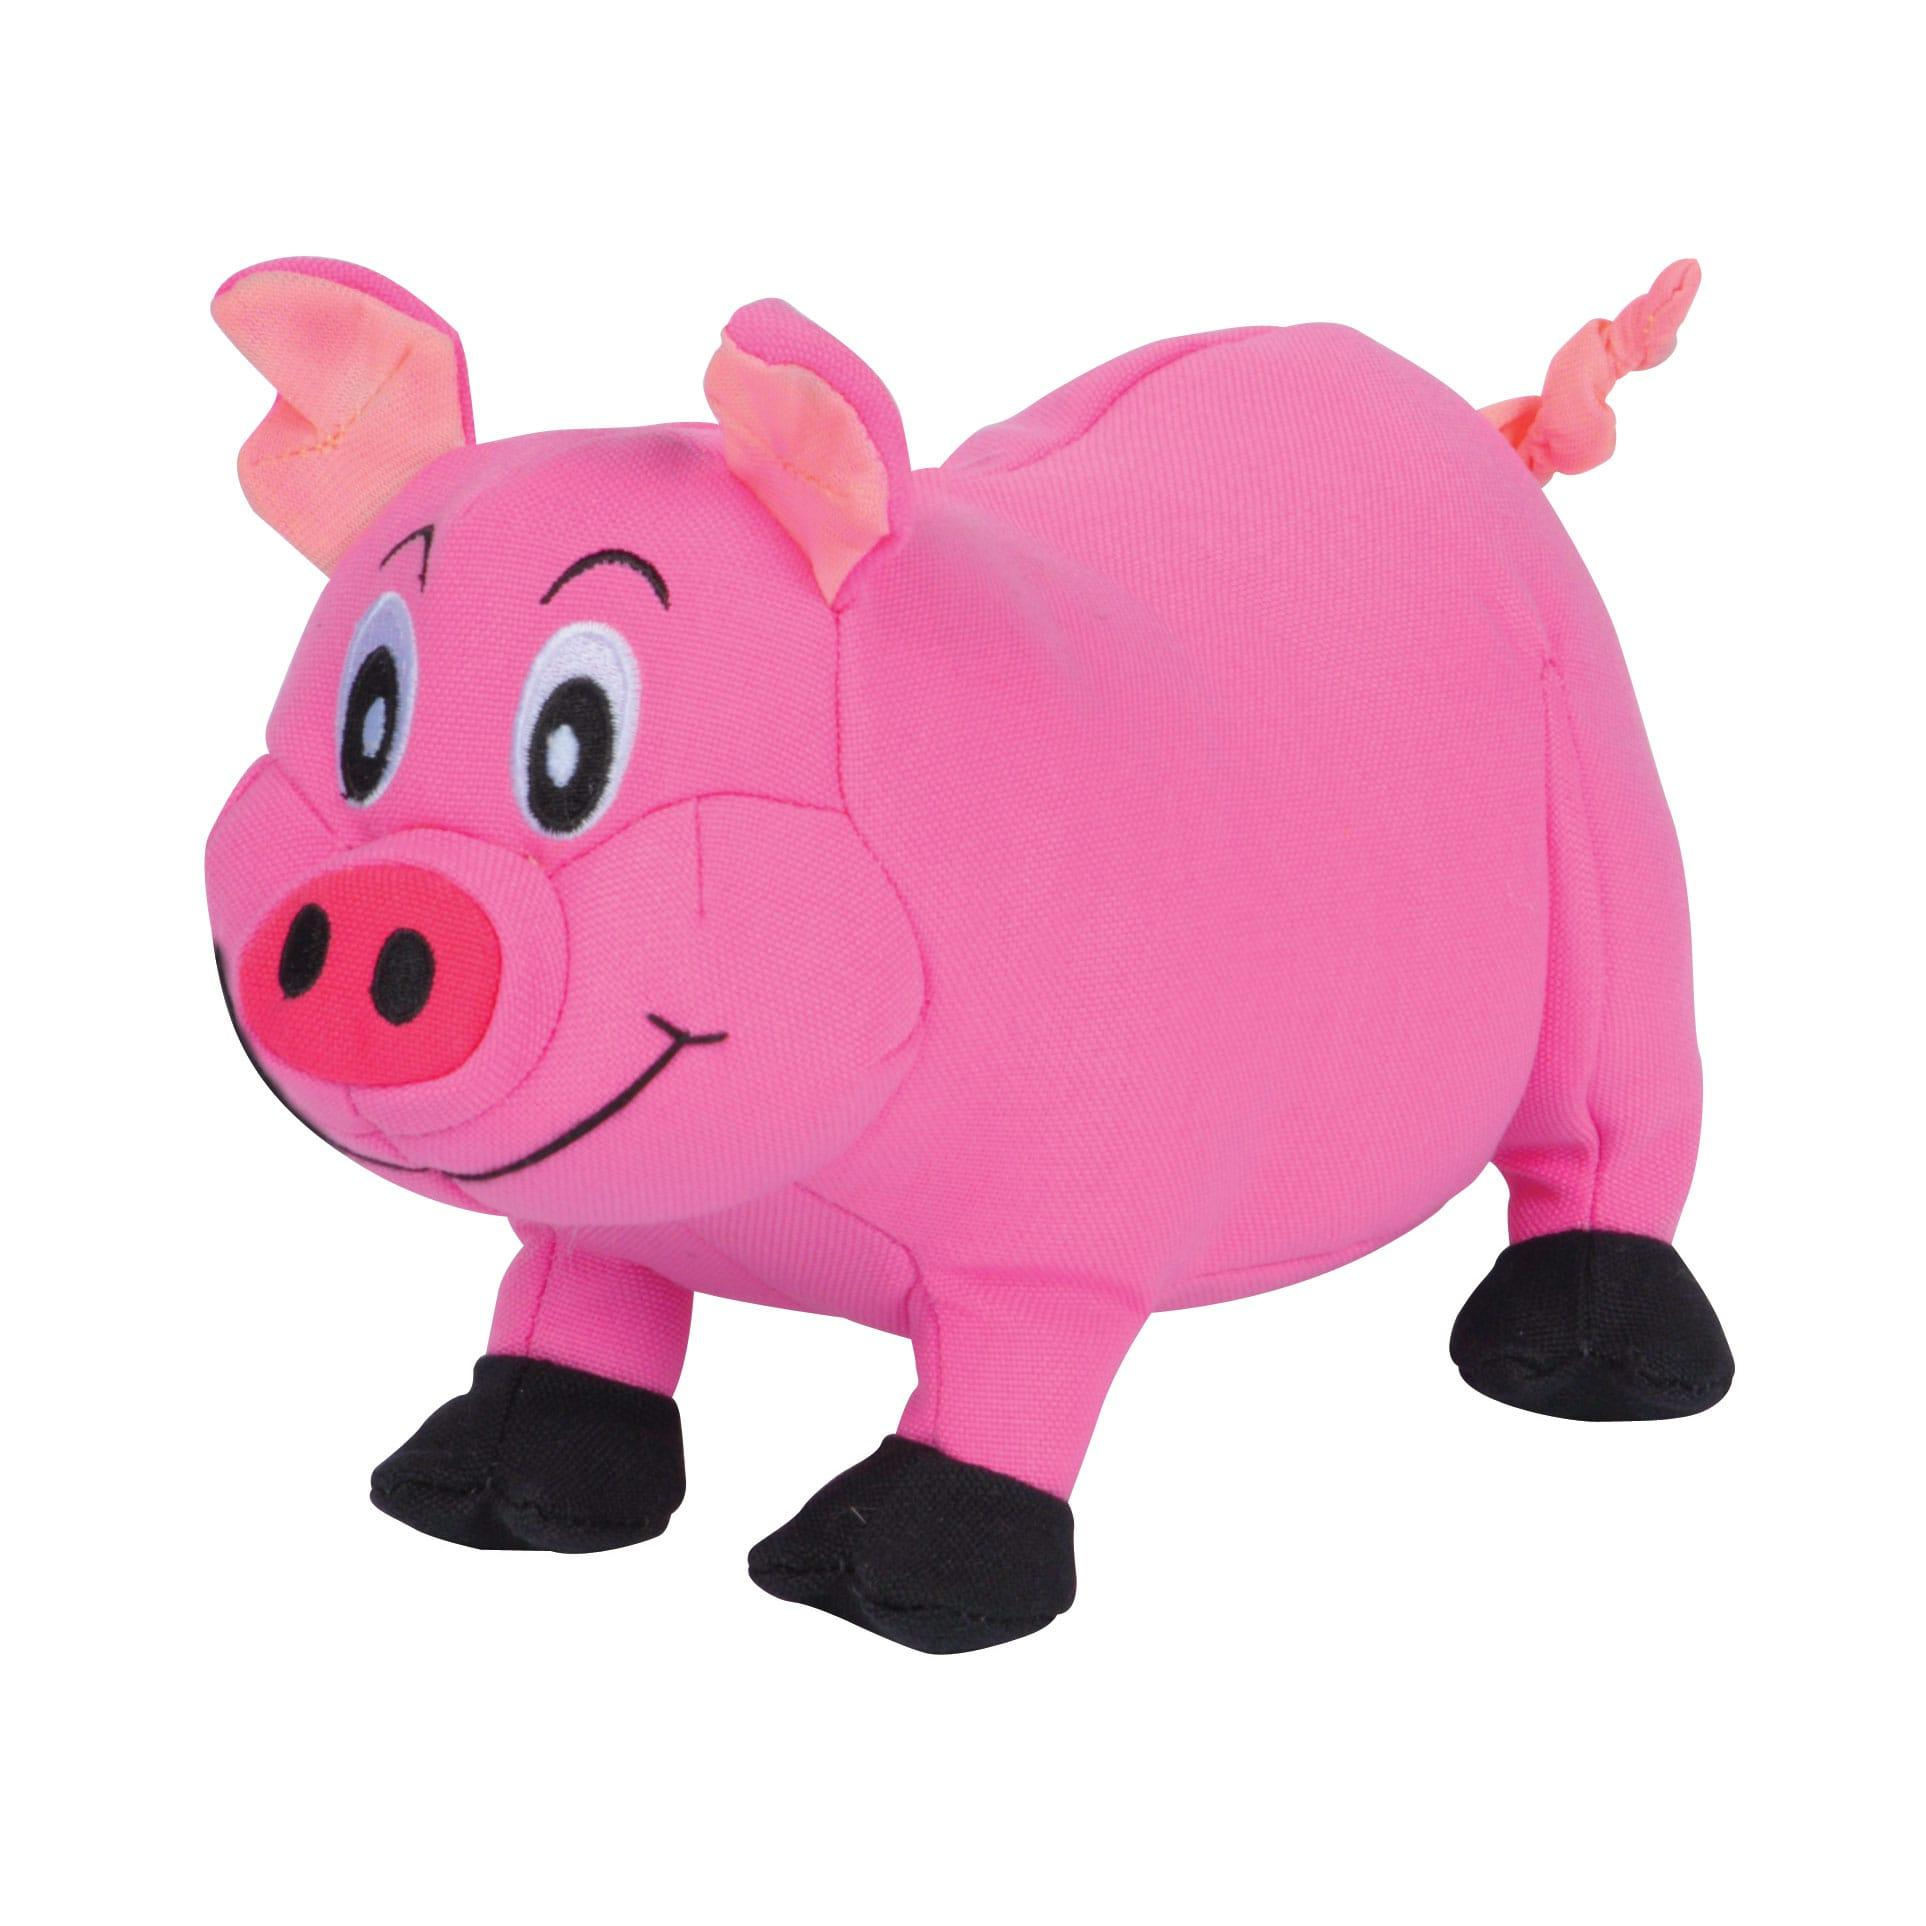 Smart Pet Love Tender-Tuffs Plump Pig Dog Toy, Pink